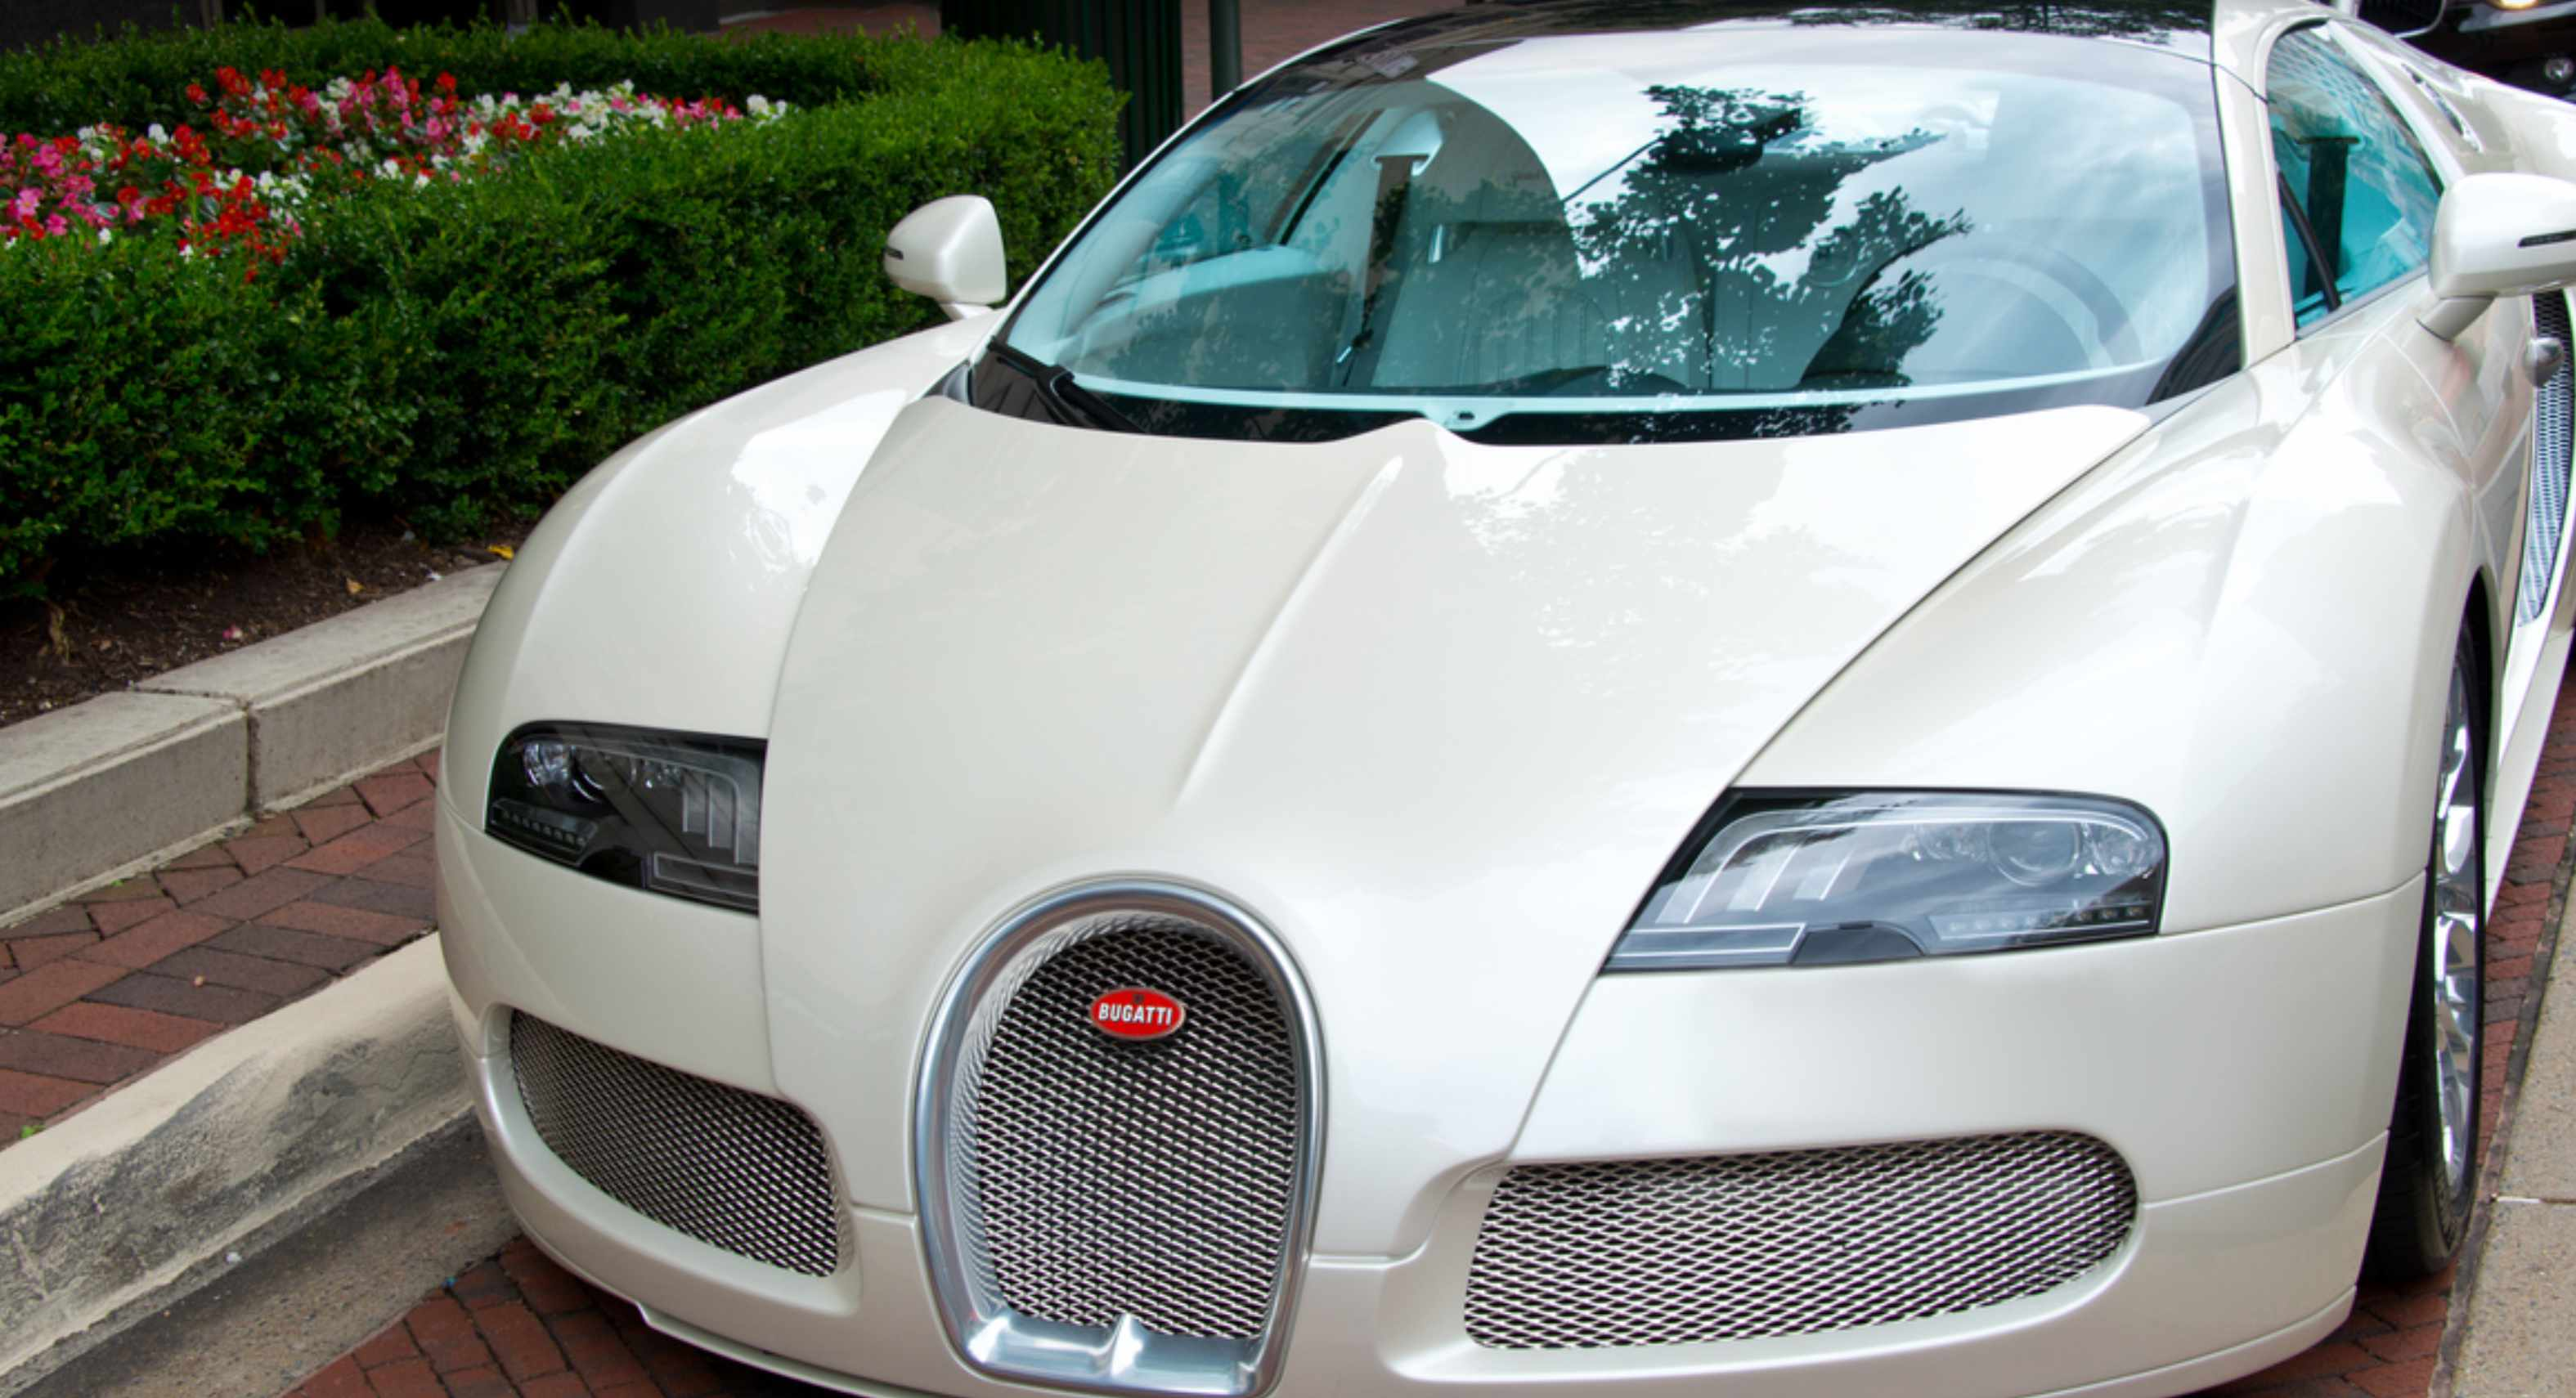 Bitcoin podría valer lo mismo que un Lamborghini o un Bugatti advierten expertos